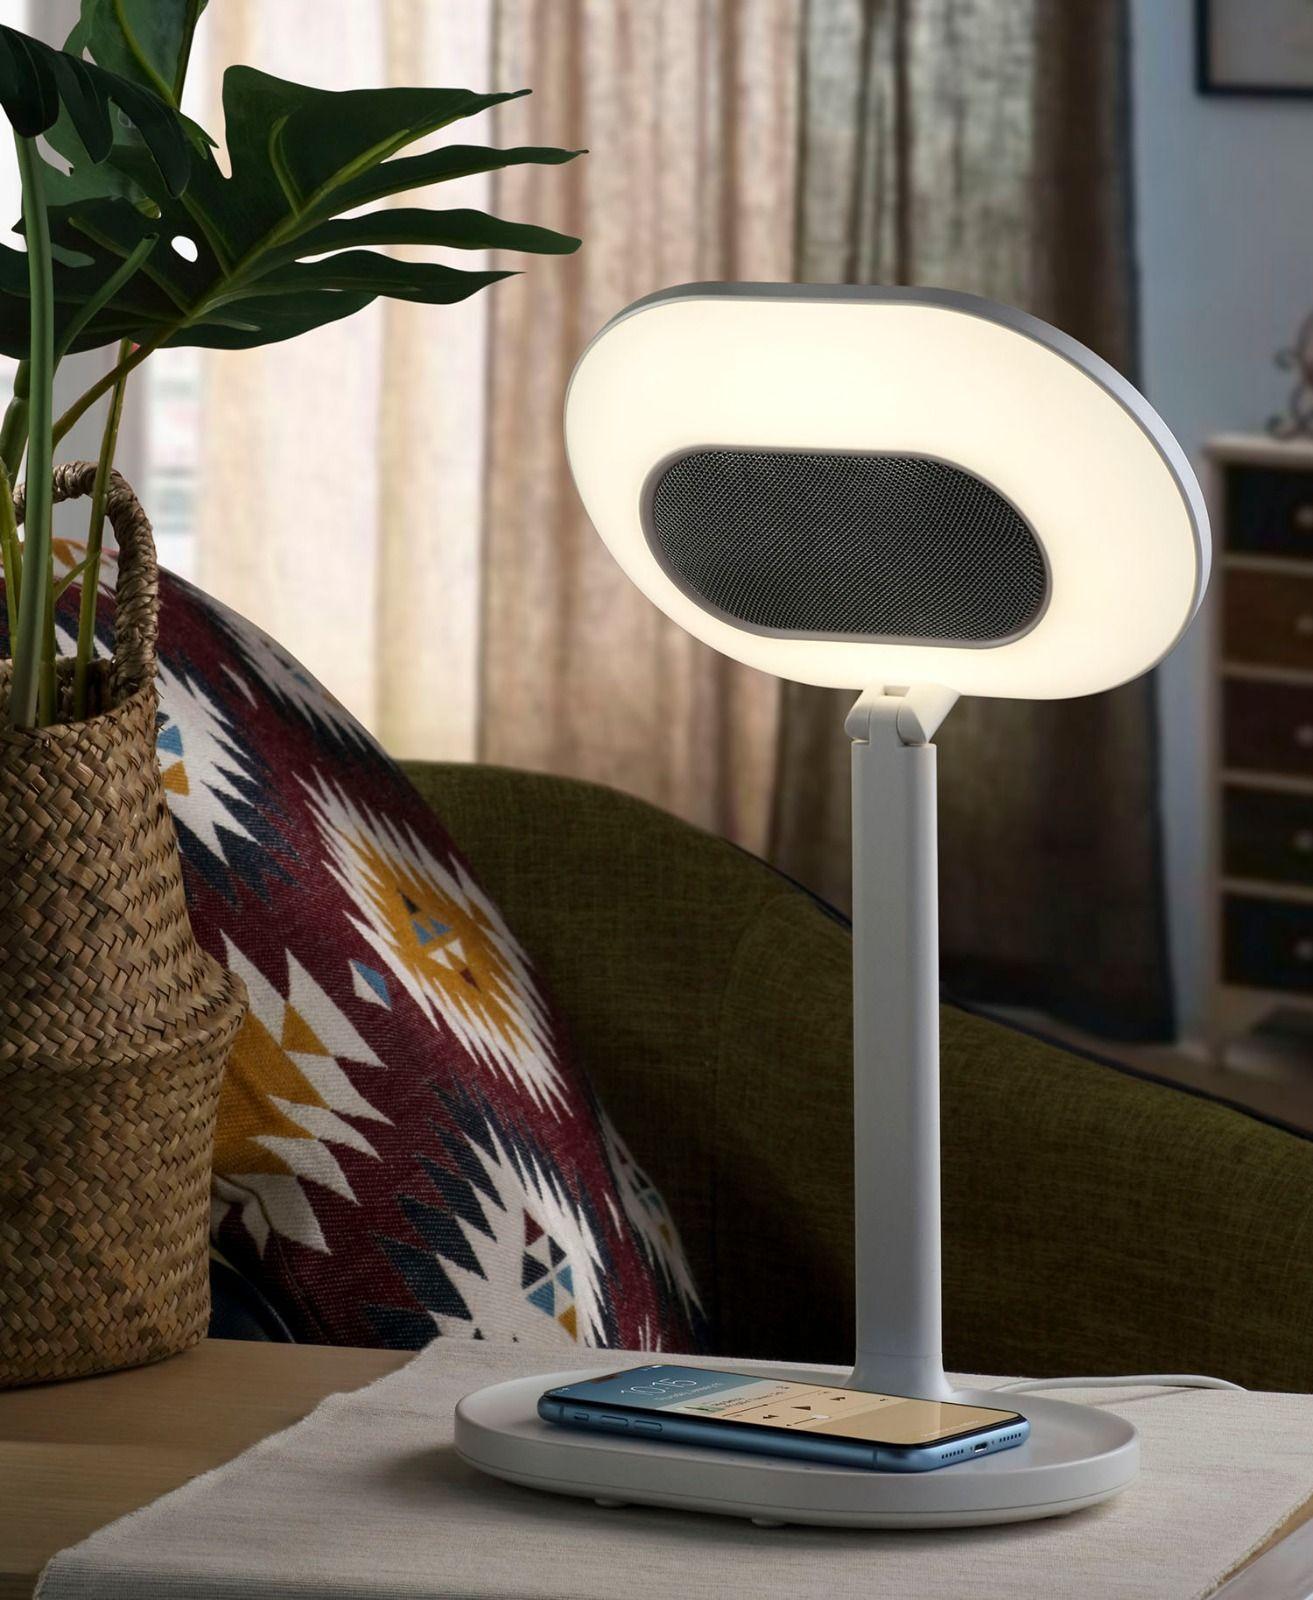 Momax Q Led Mirror化妝鏡連無線充電及藍牙 香港行貨 Ql3ukw Led Mirror Mirror Lamp